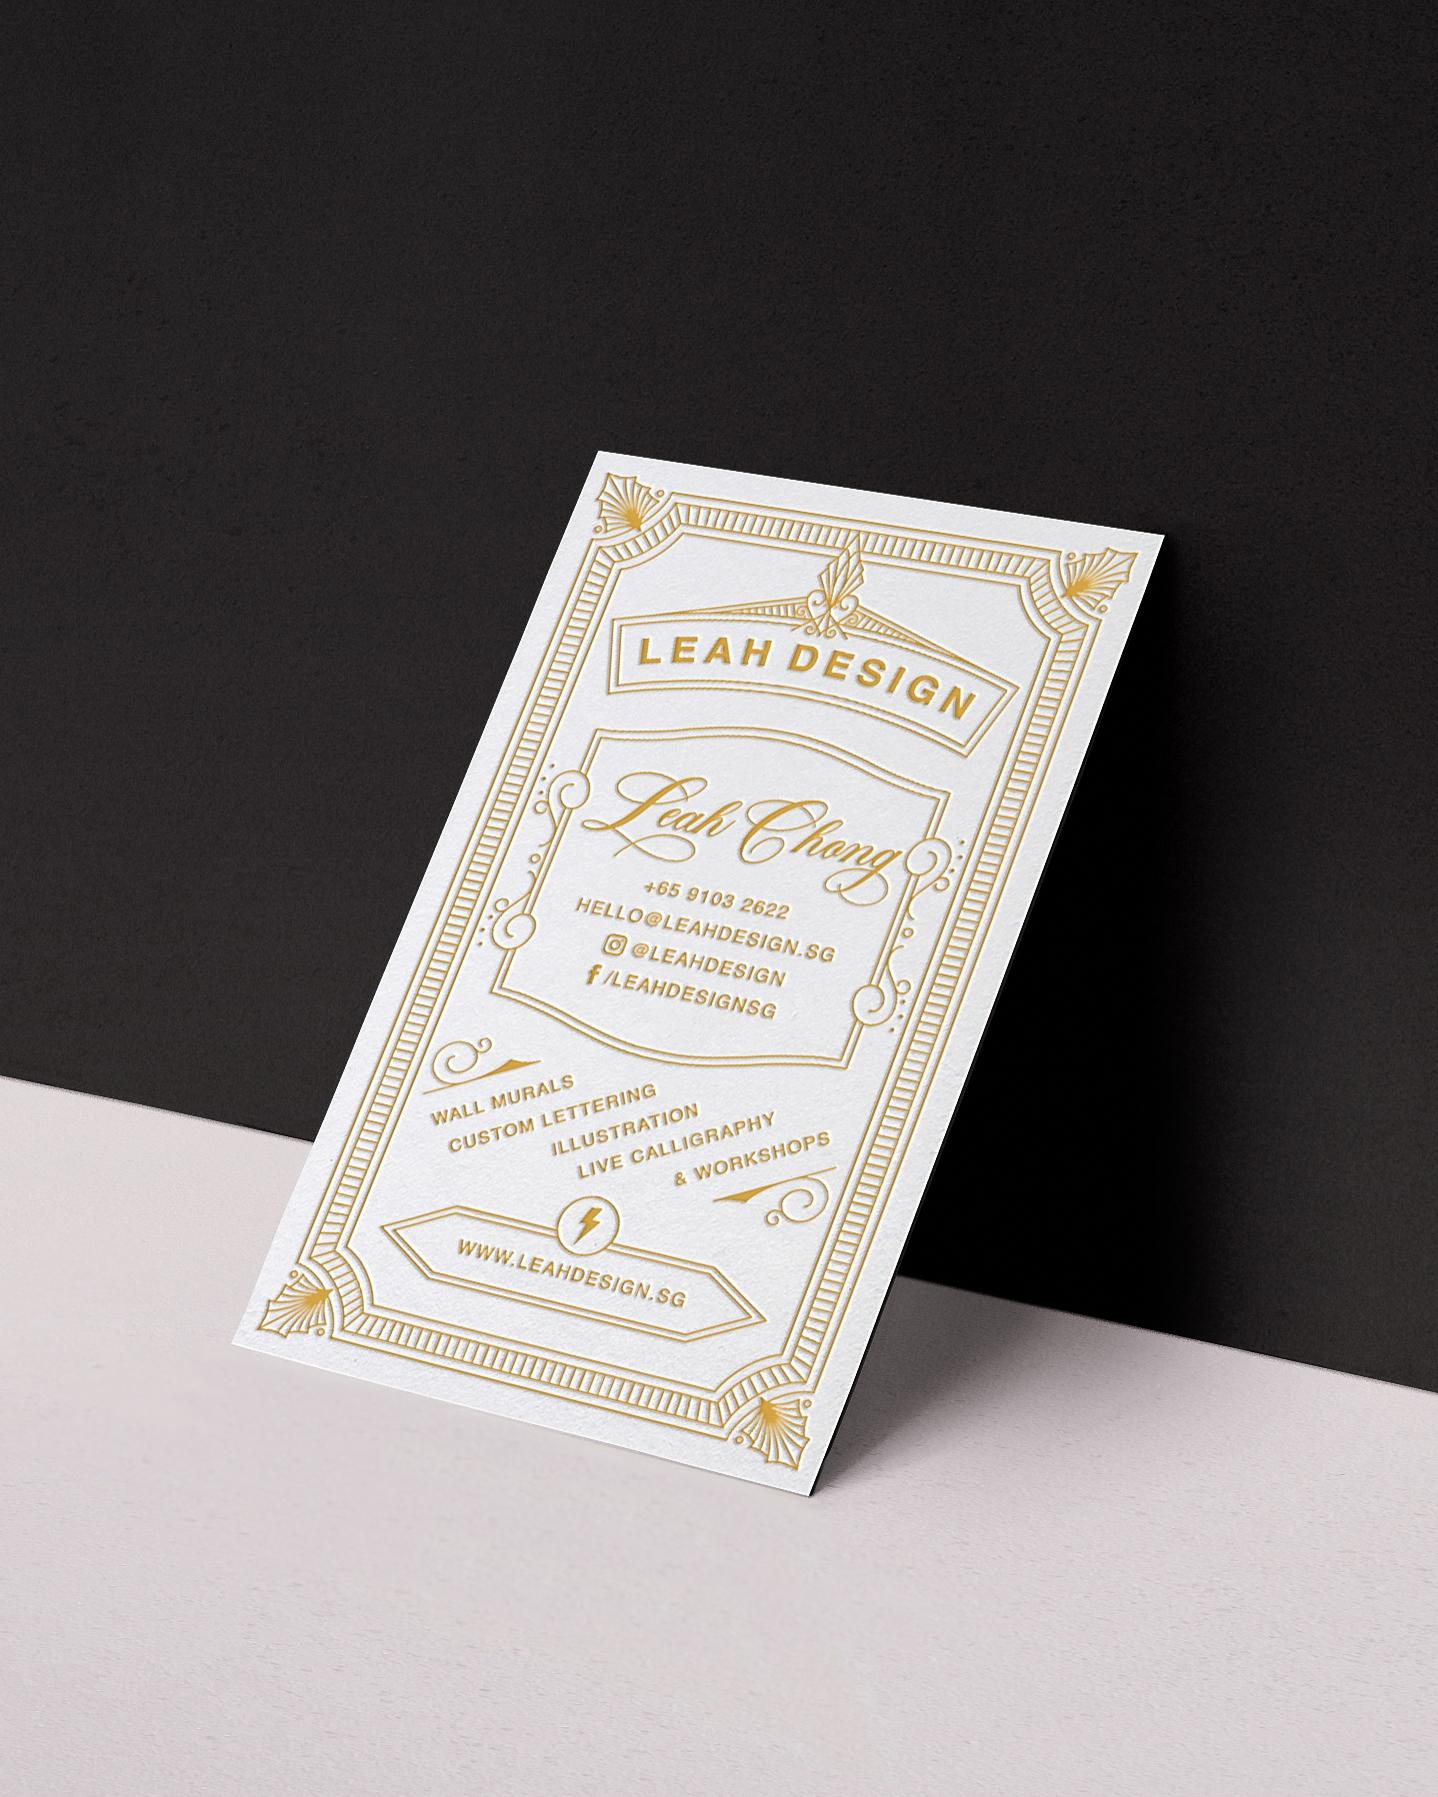 Leah Design Business Card Design Letterpress.jpg